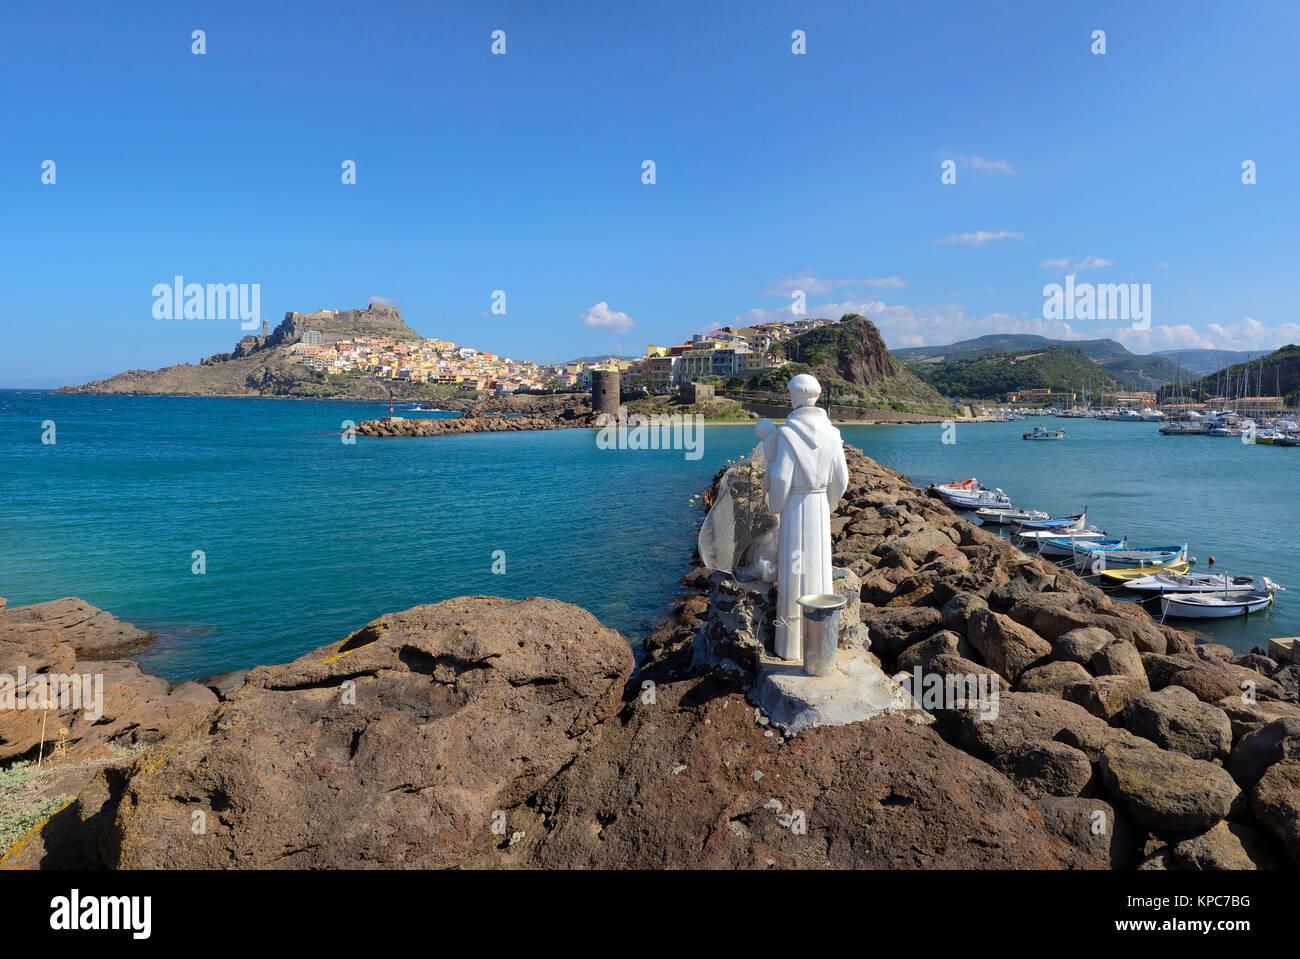 Sailor Schutzpatron Abbildung am Hafen nach Castelsardo, Sardinien, Italien, Mittelmeer, Europa Stockbild